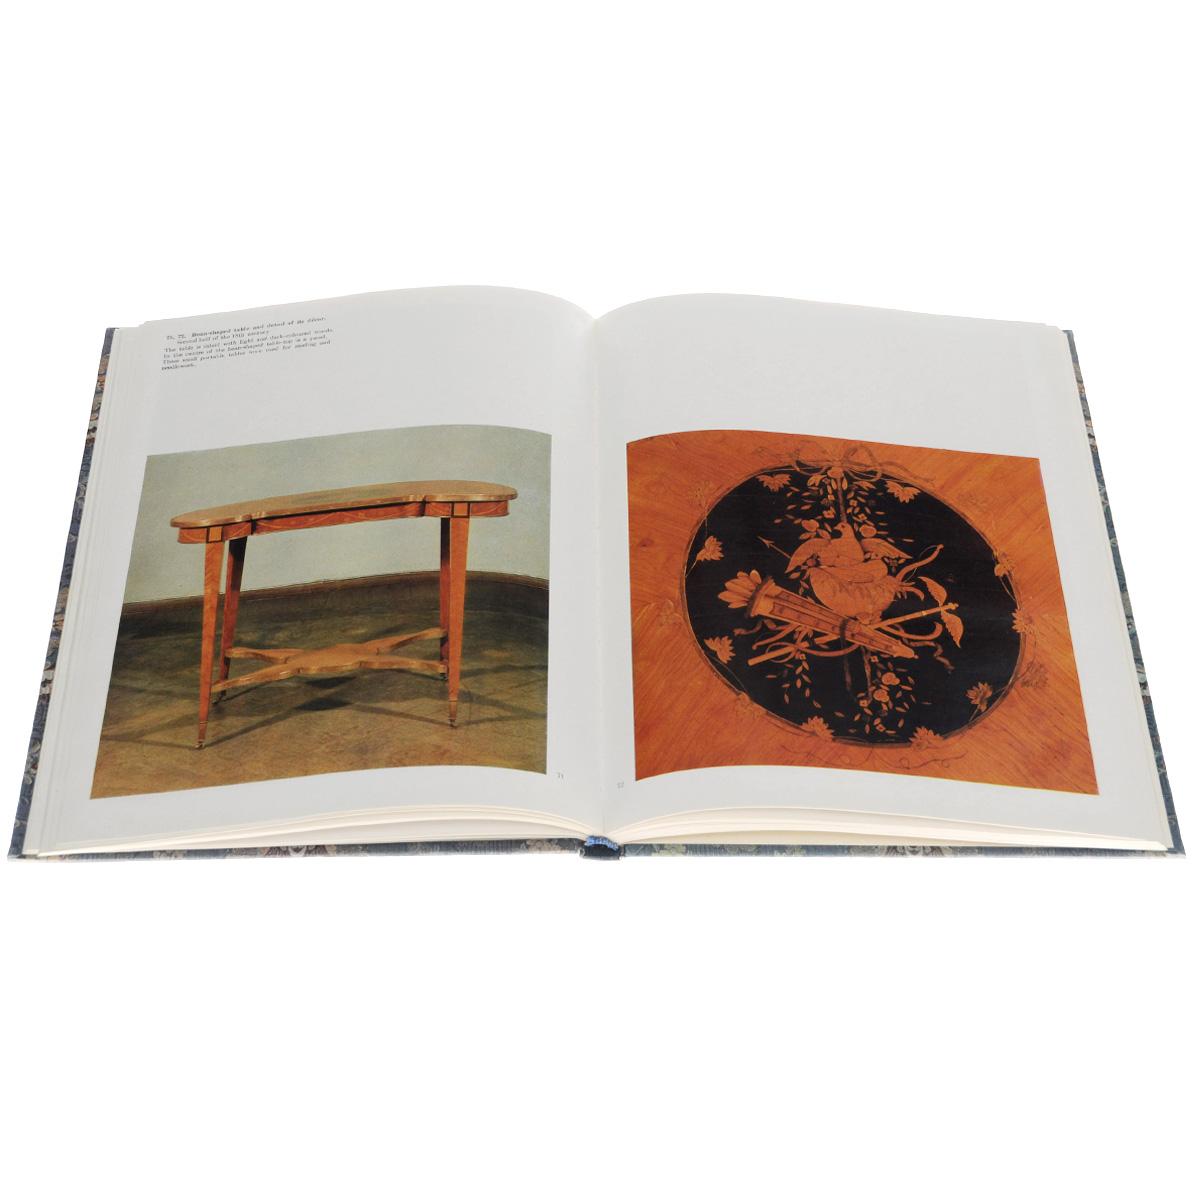 ������� ���������� ��������� XVIII - ������ XX ���� / Russian Applied Art: Eighteenth to Early Twentieth Century